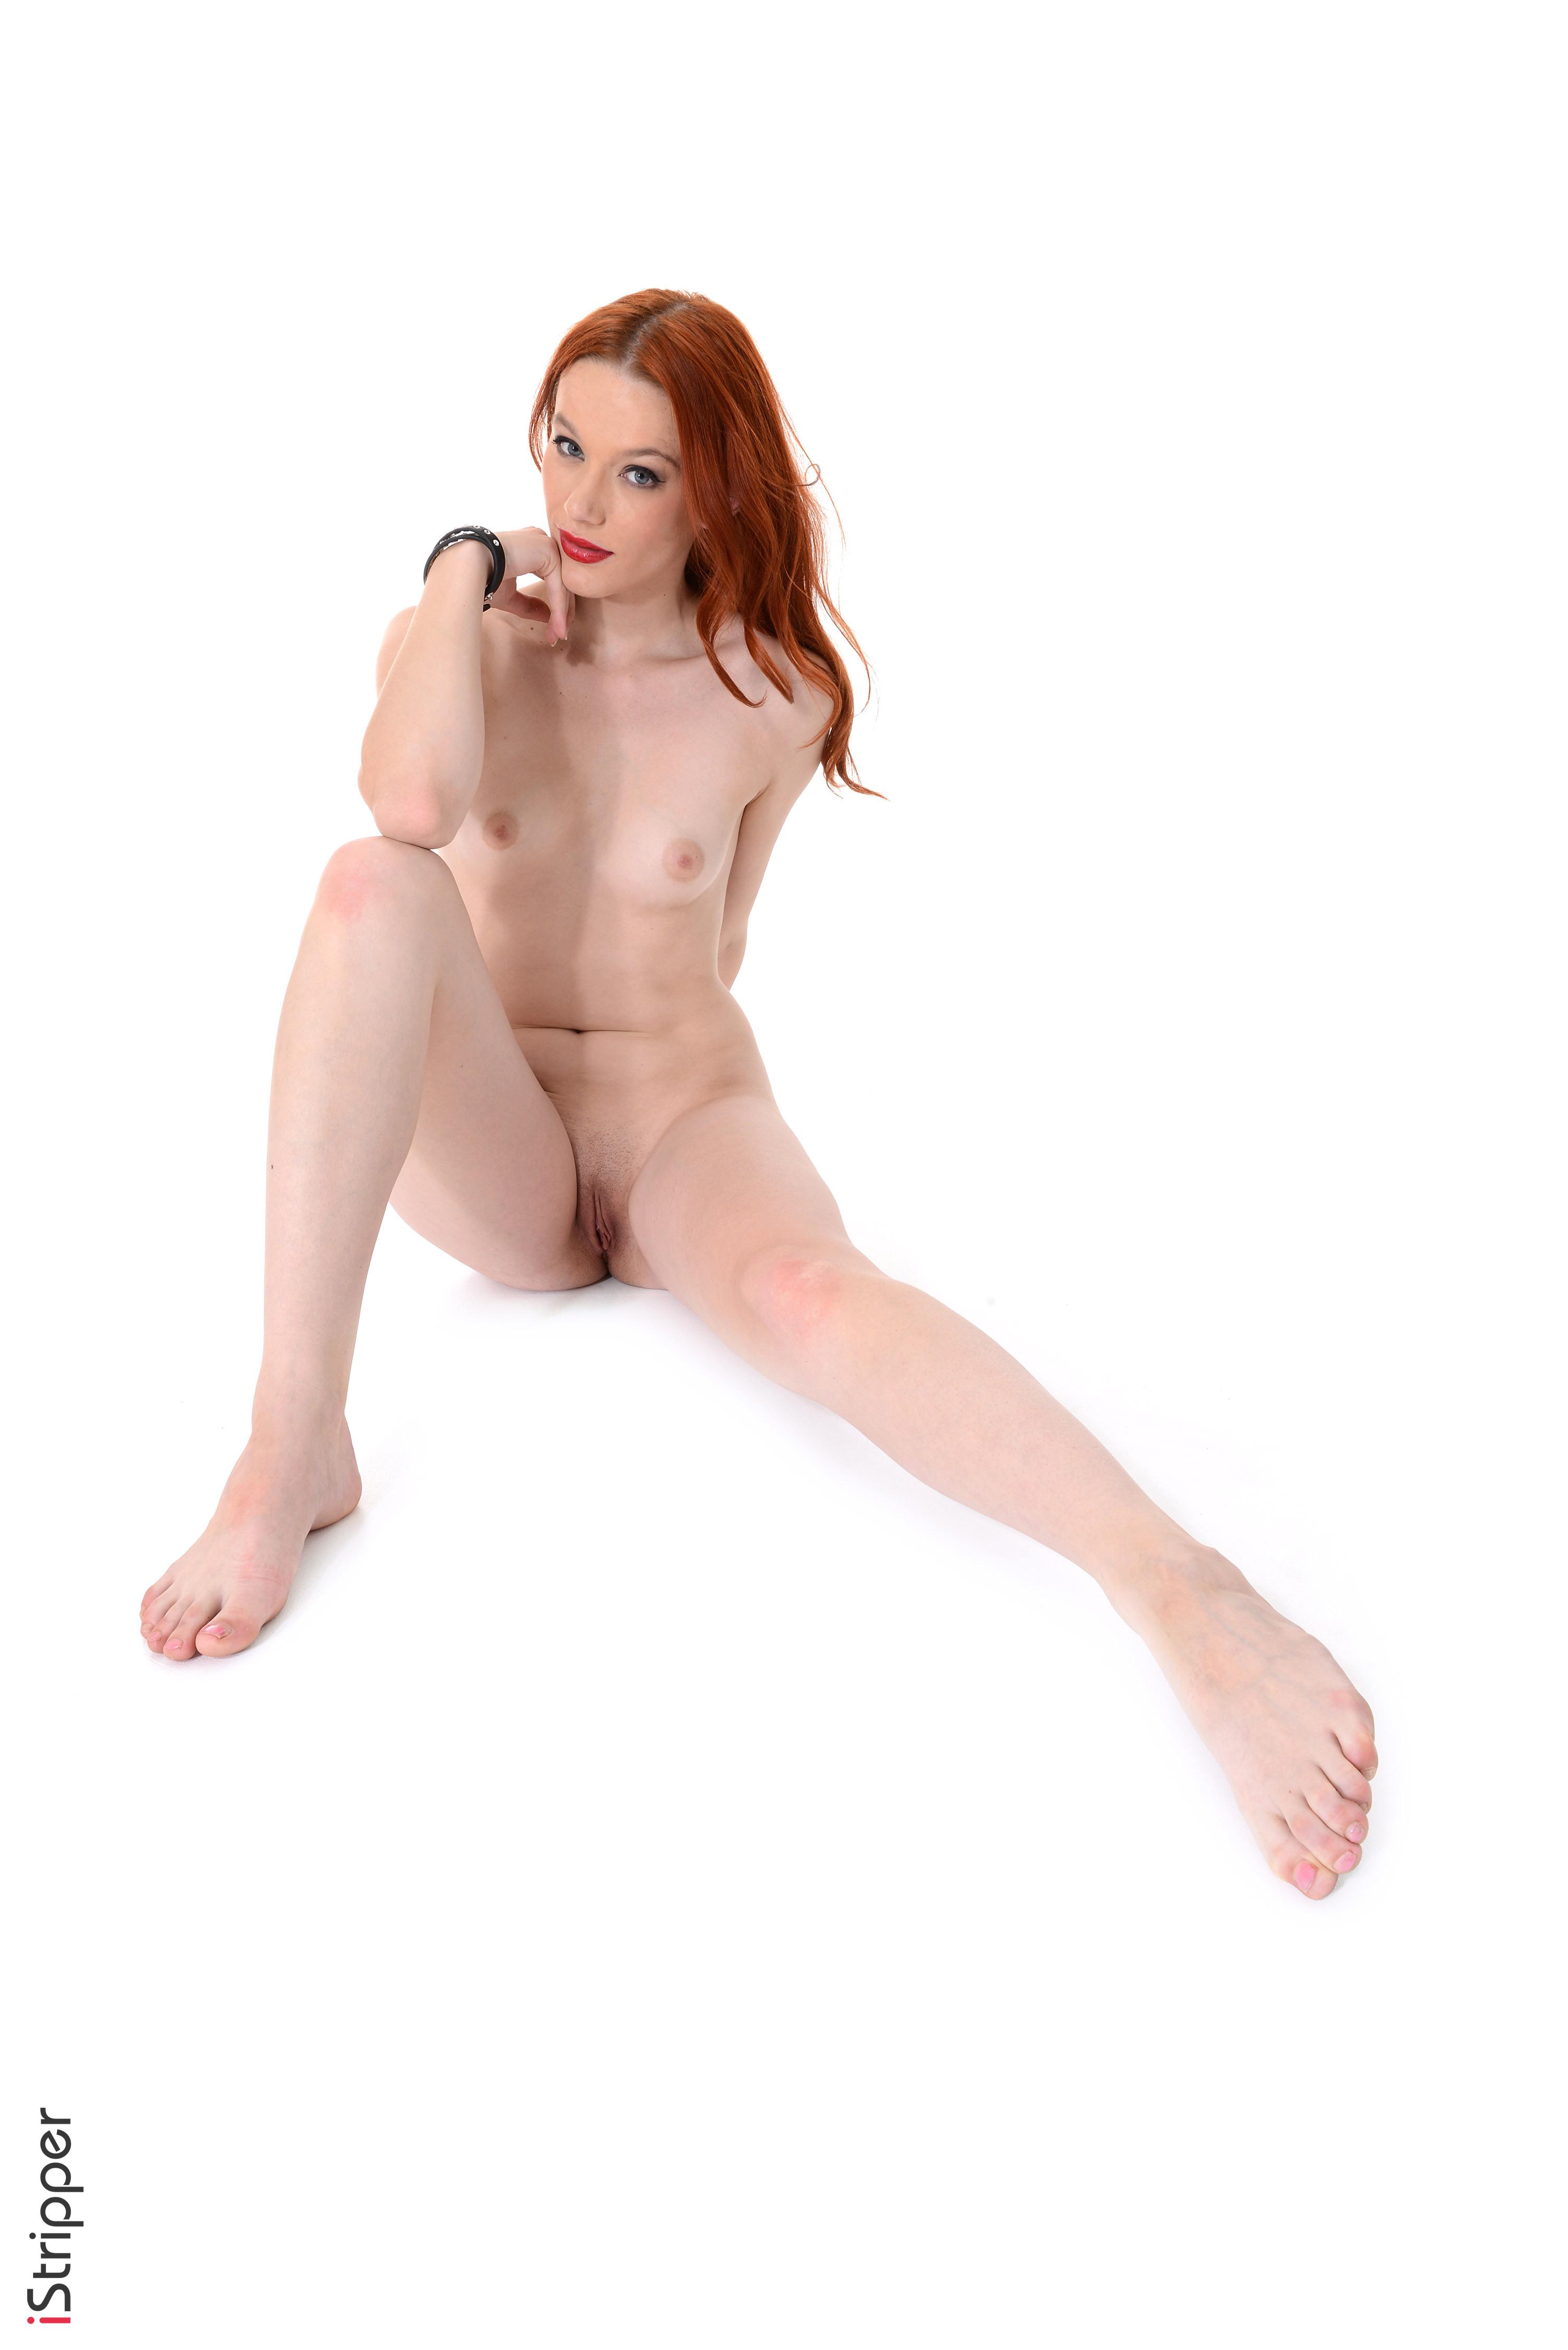 free wallpaper of naked women